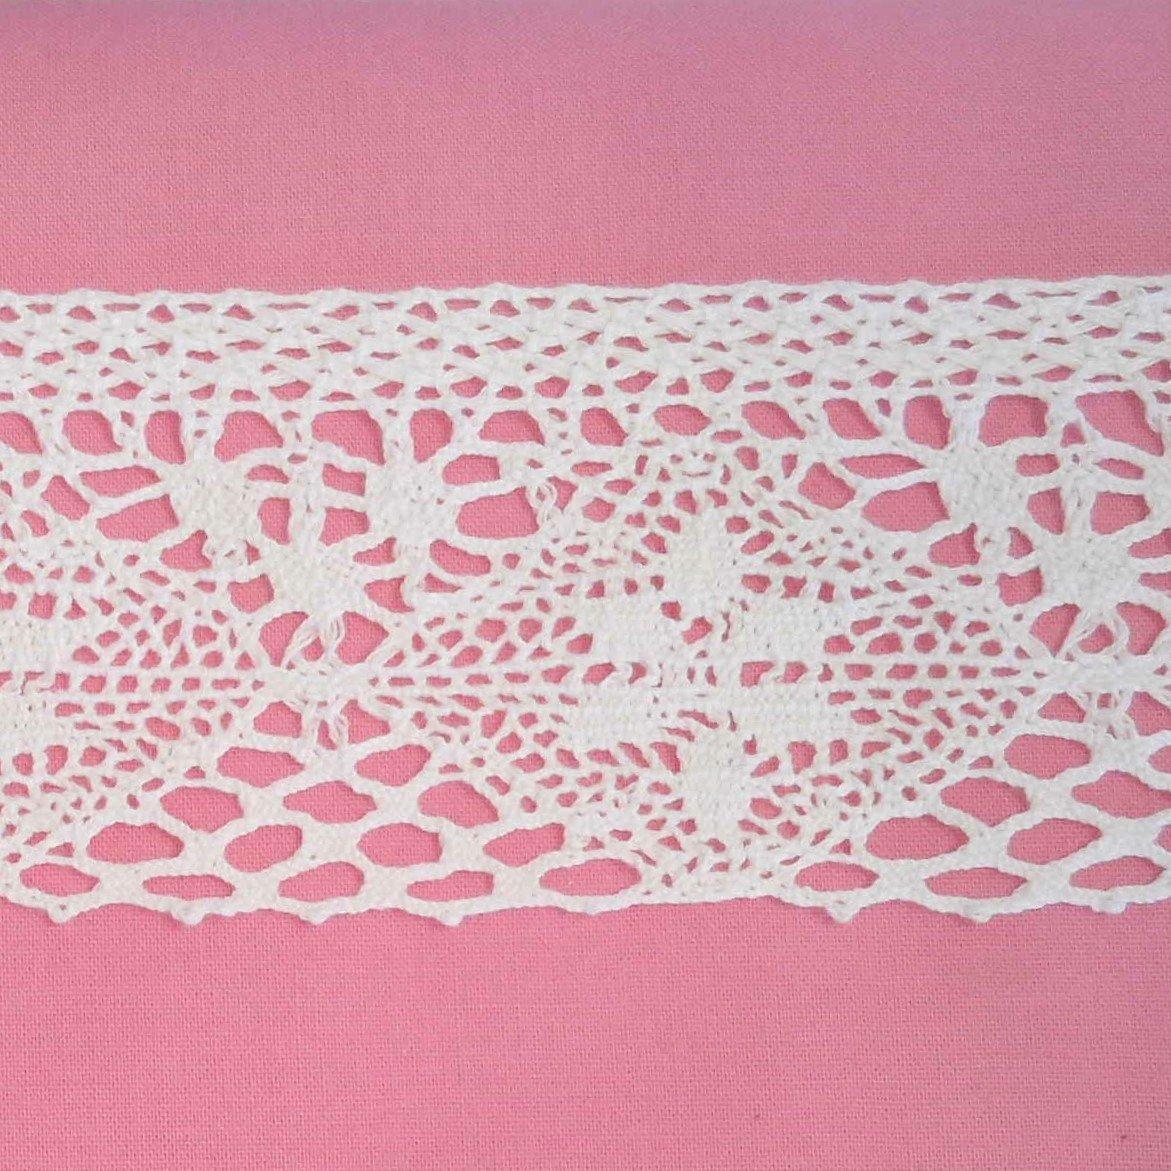 Aurora White Cotton Crochet Lace